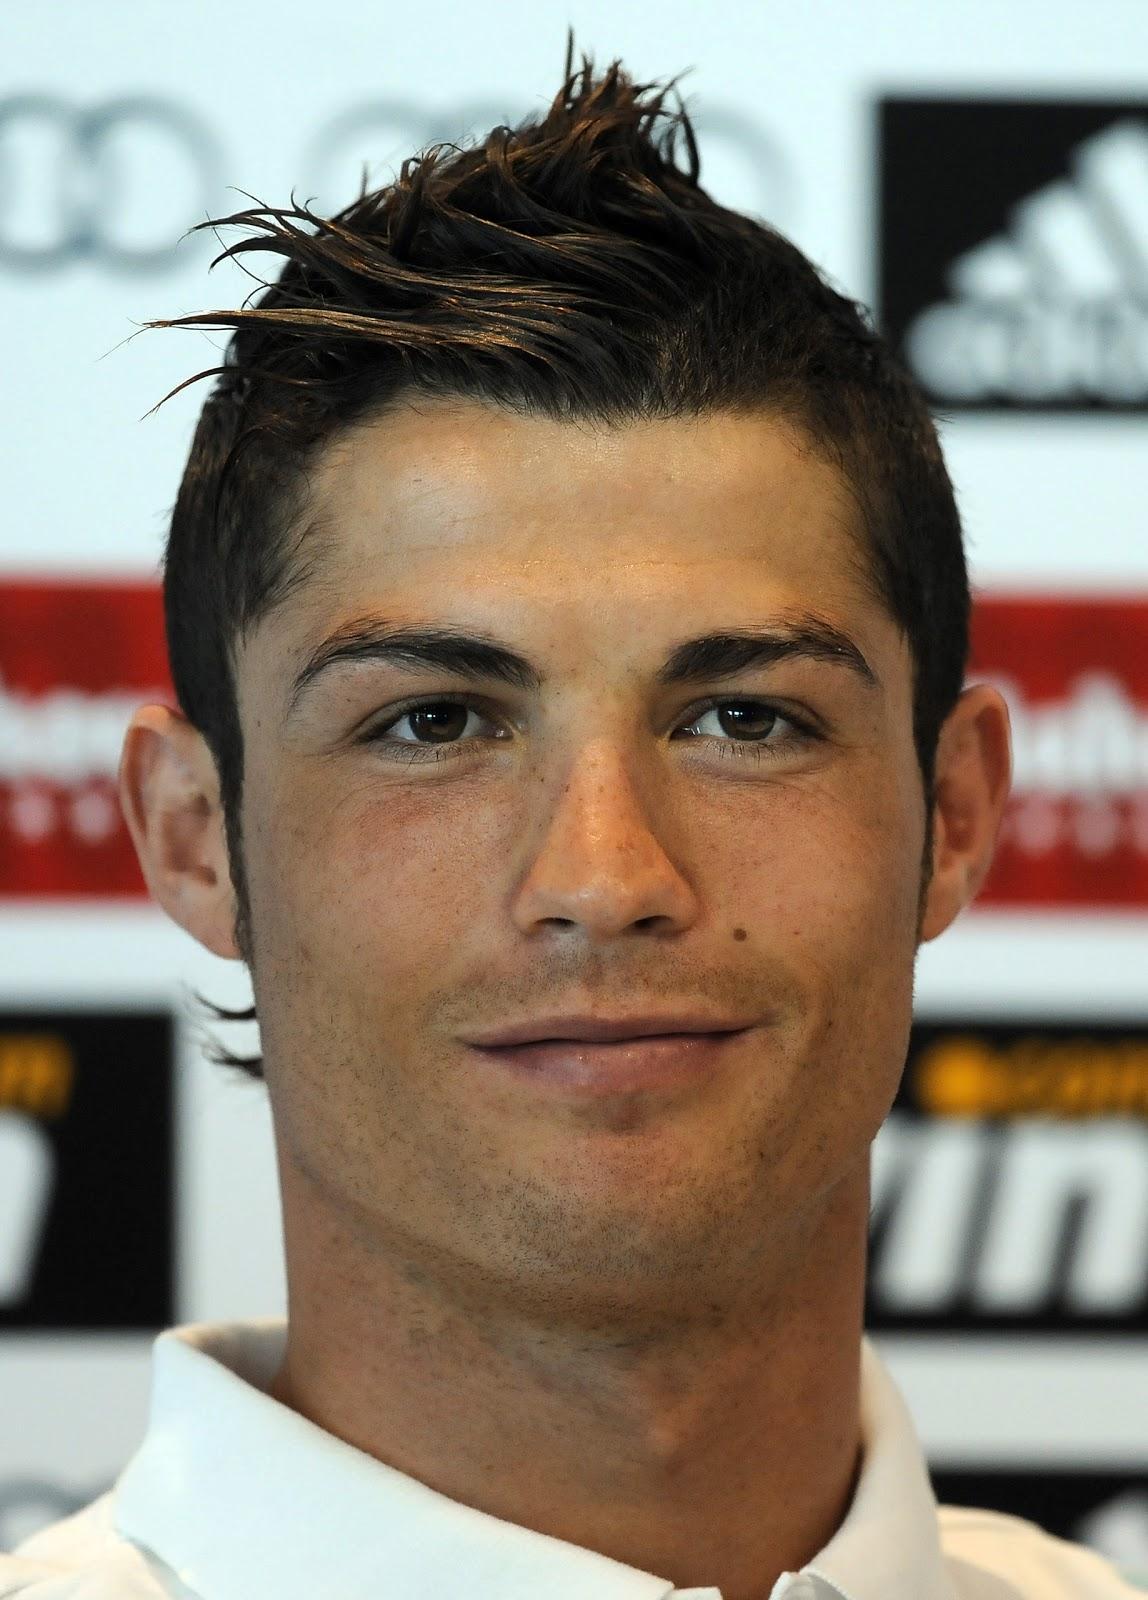 Coloriage Gratuit Ronaldo.Coloriage Gratuit Cristiano Ronaldo Valleypestcontrolplains Com